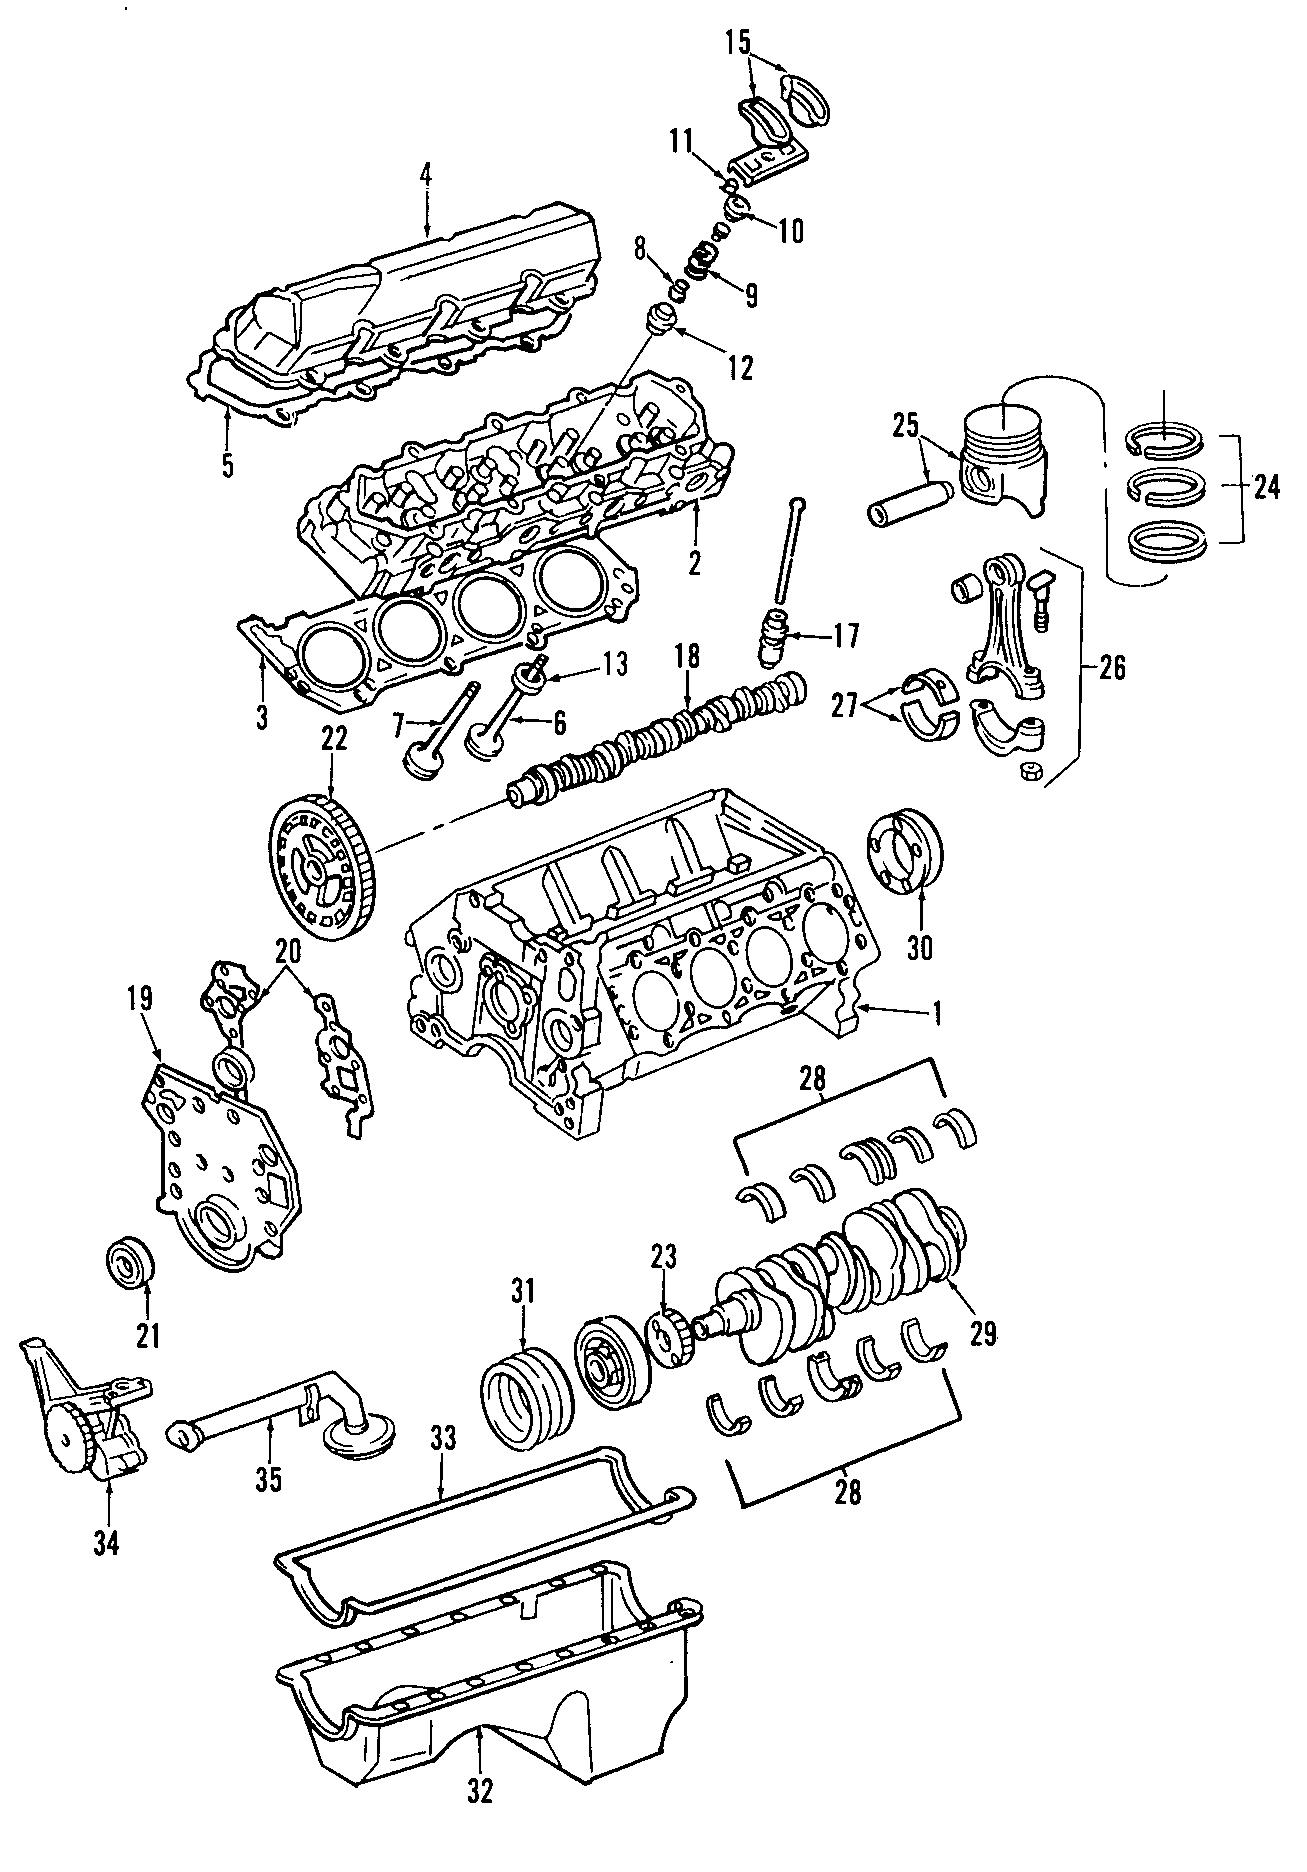 Ford Excursion Engine Timing Cover Gasket. DIESEL, LITER